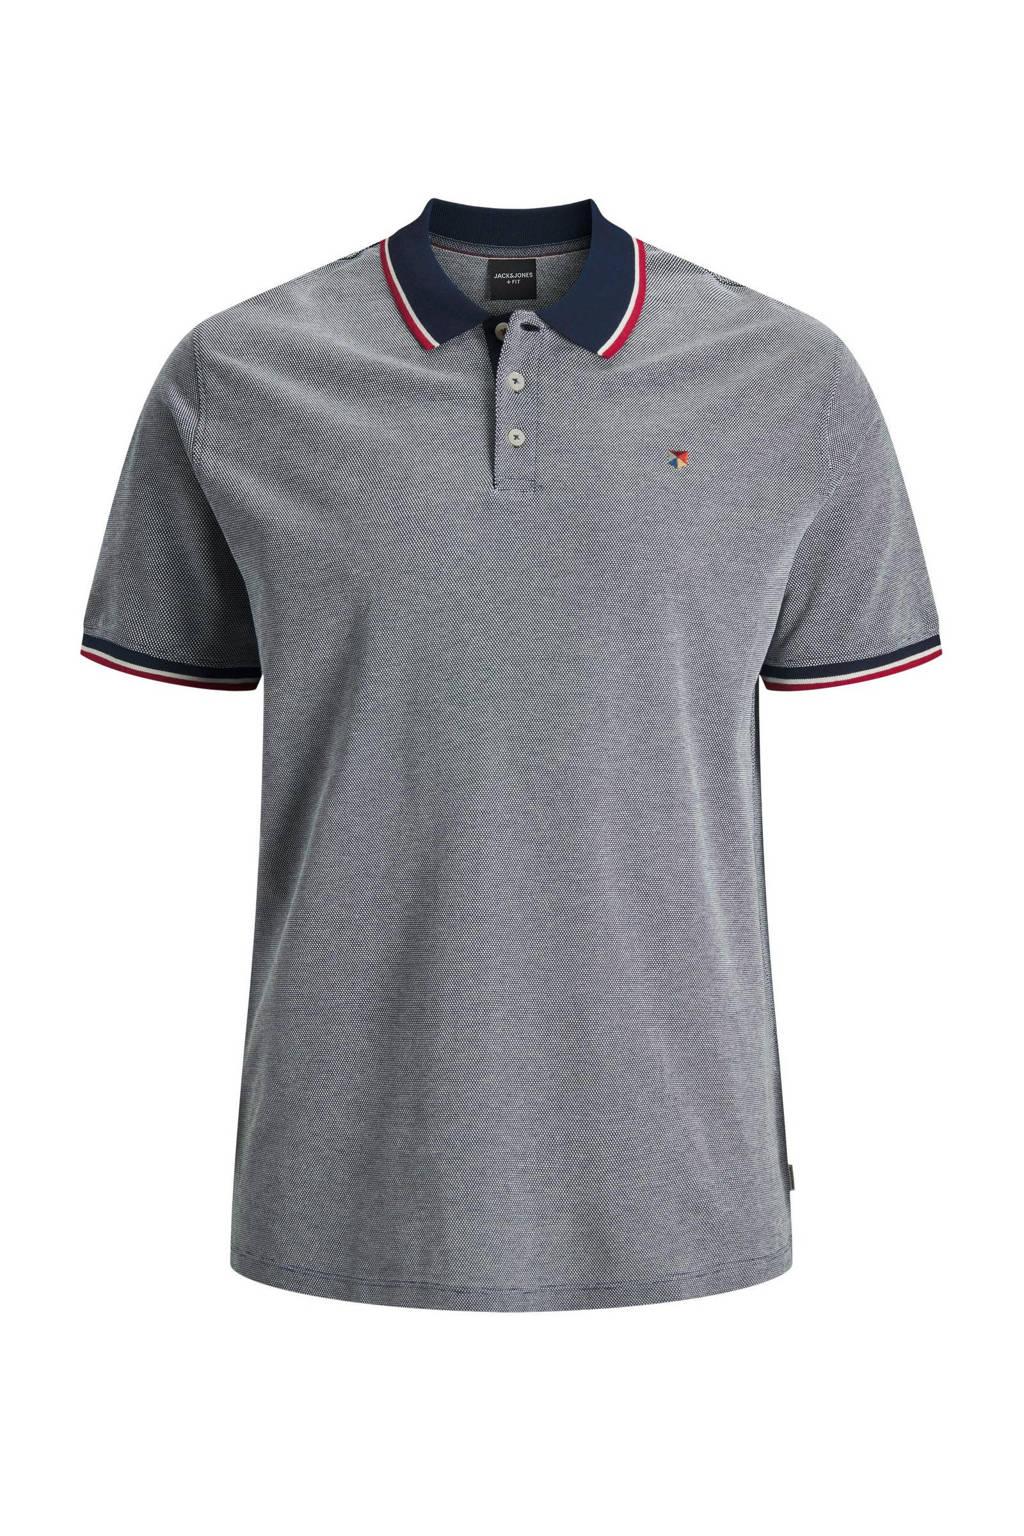 JACK & JONES PLUS SIZE gemêleerde regular fit polo met contrastbies Plus Size donkerblauw, Donkerblauw